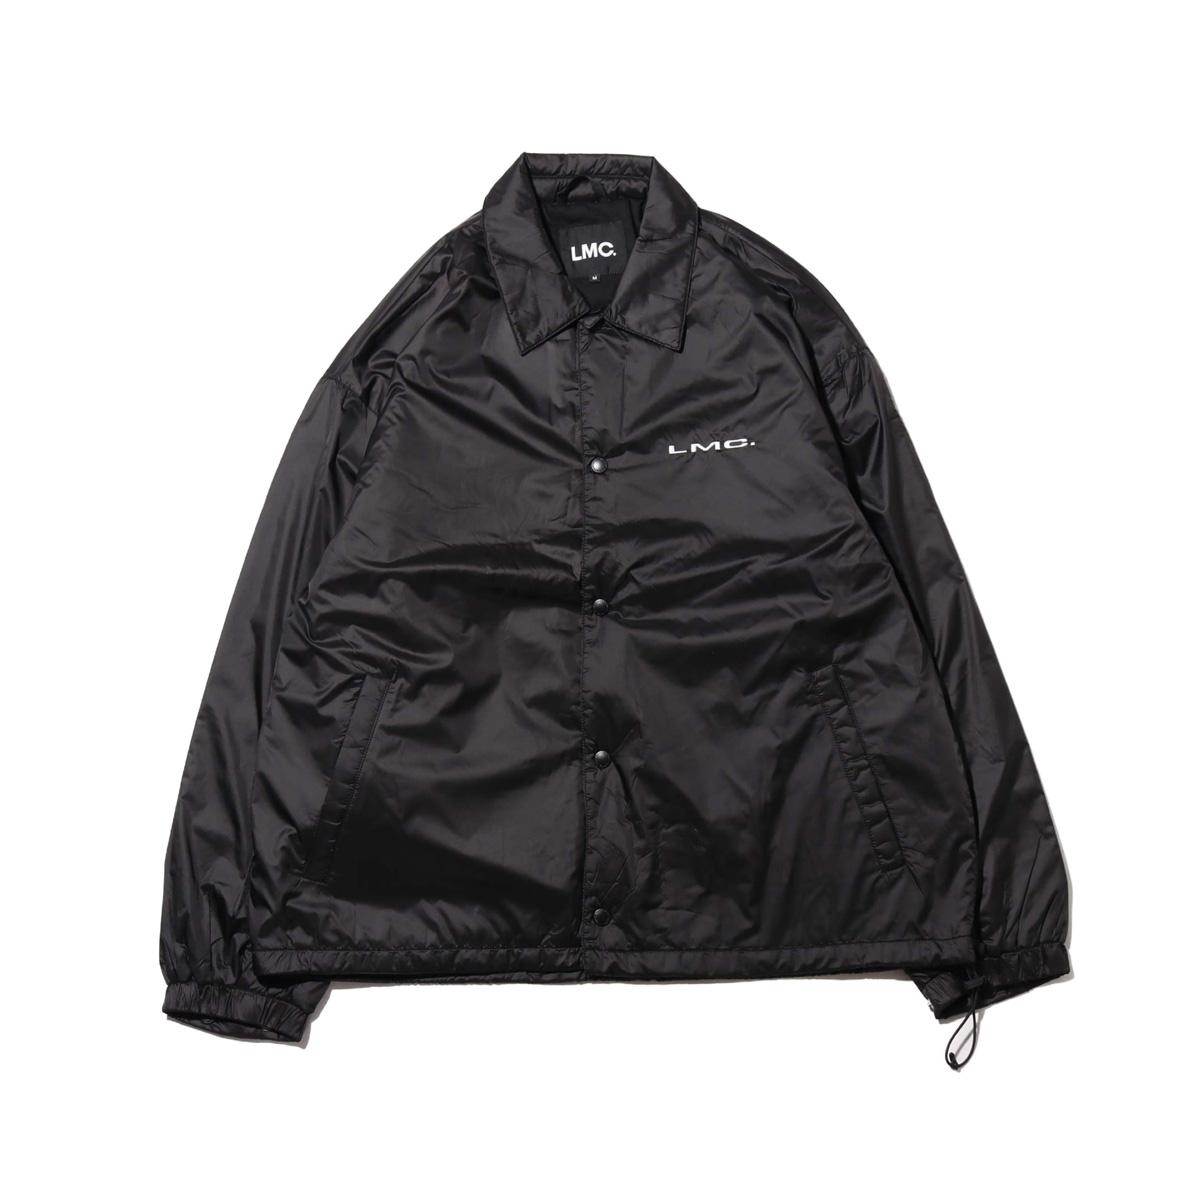 LMC OVERSIZED LIGHT PADDED JACKET (LMC オーバーサイズ ライト パデッド ジャケット)BLACK【メンズ ジャケット】18FW-I